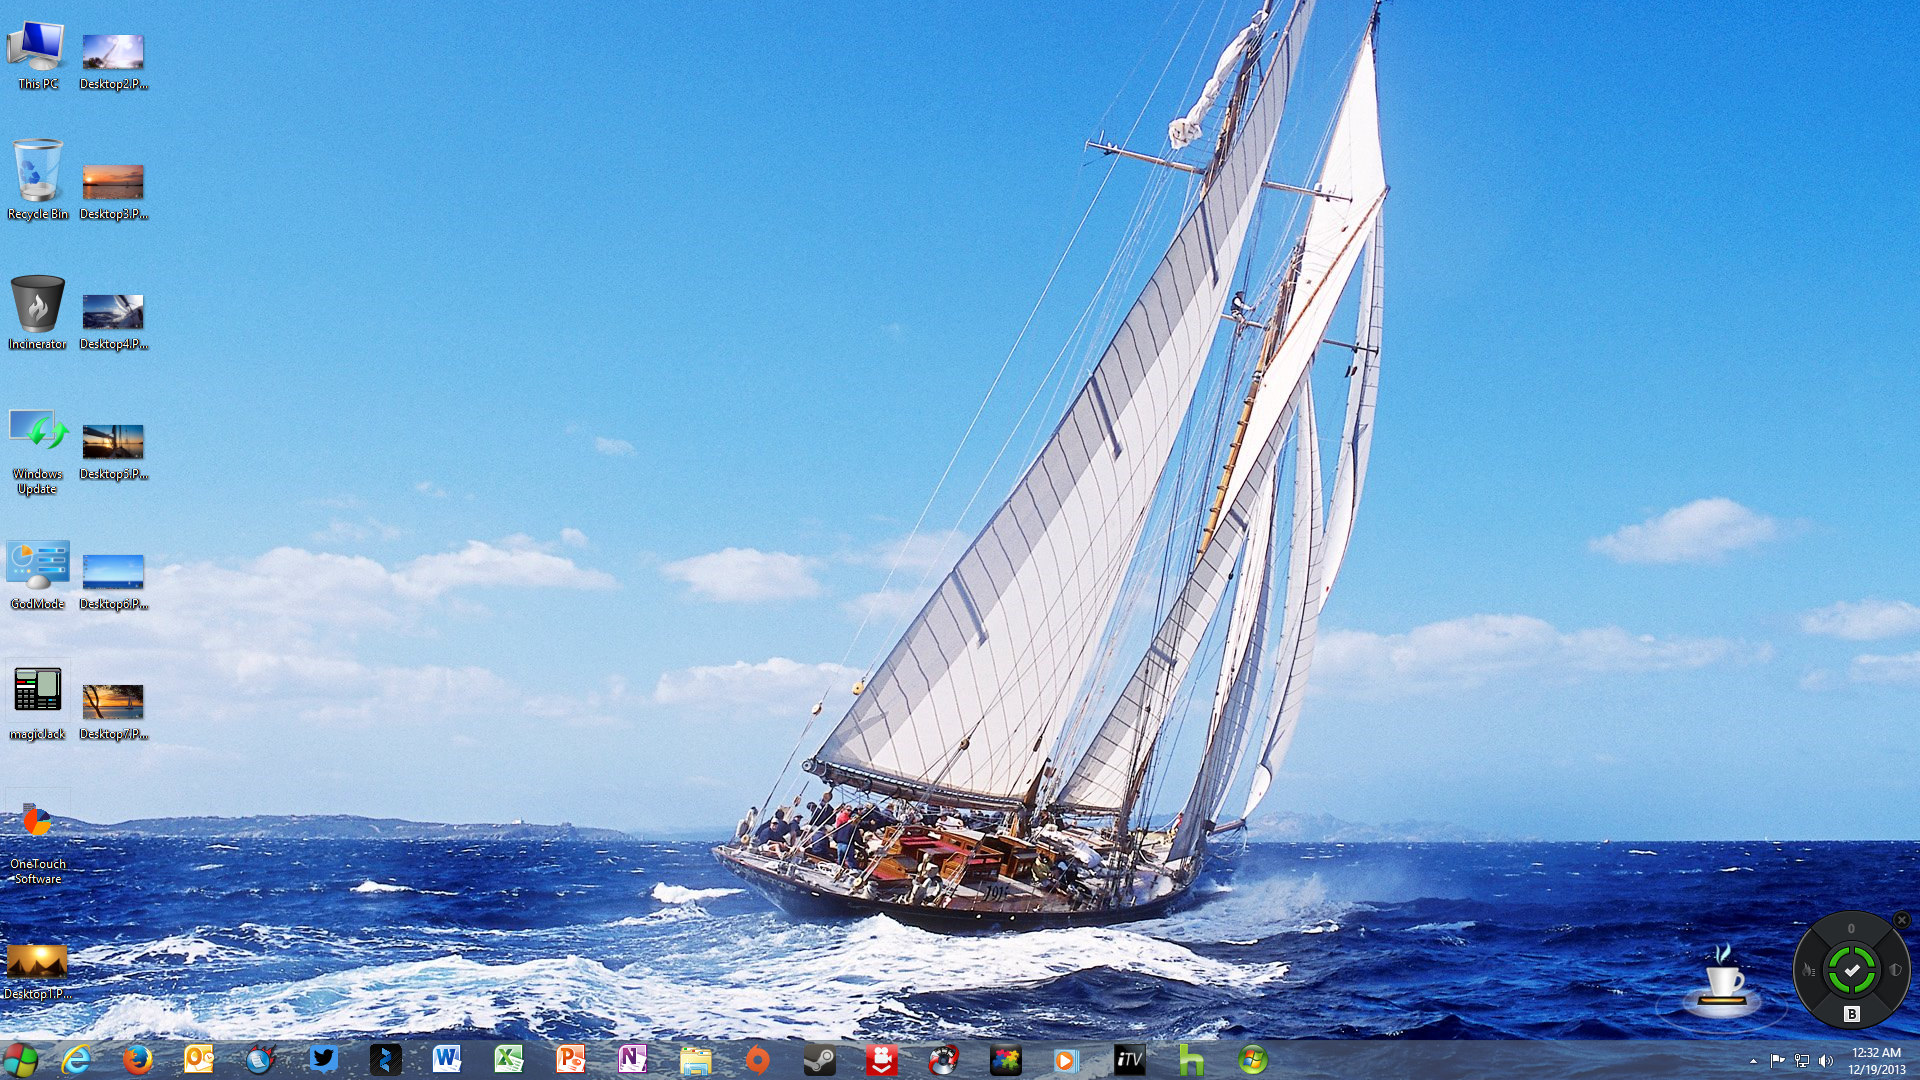 Desktop8.PNG